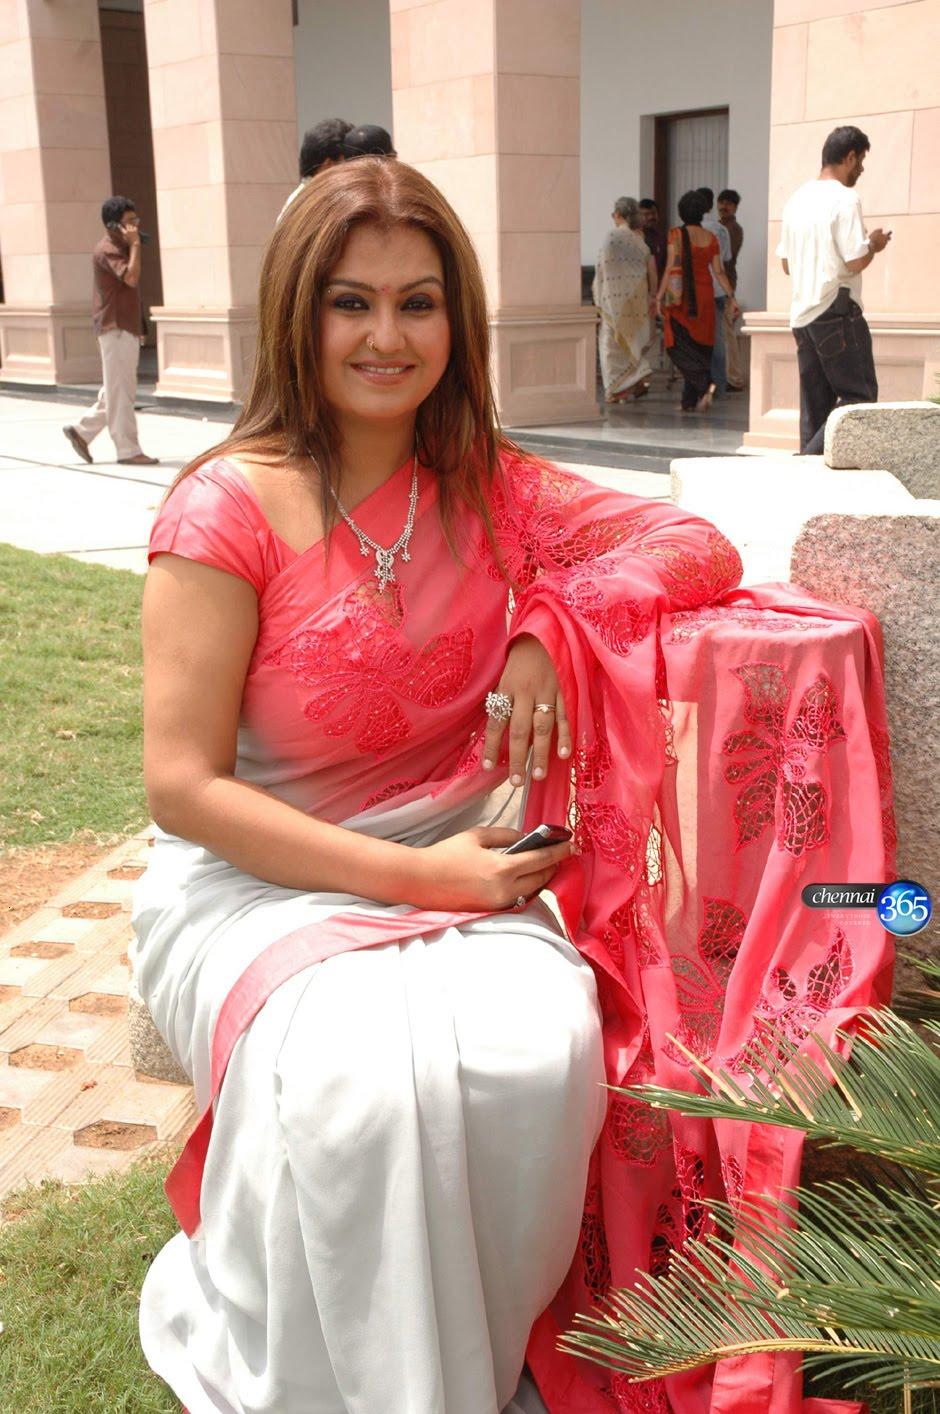 Mamta kulkarni hot songs bollywood movie dilbar title song - 4 1